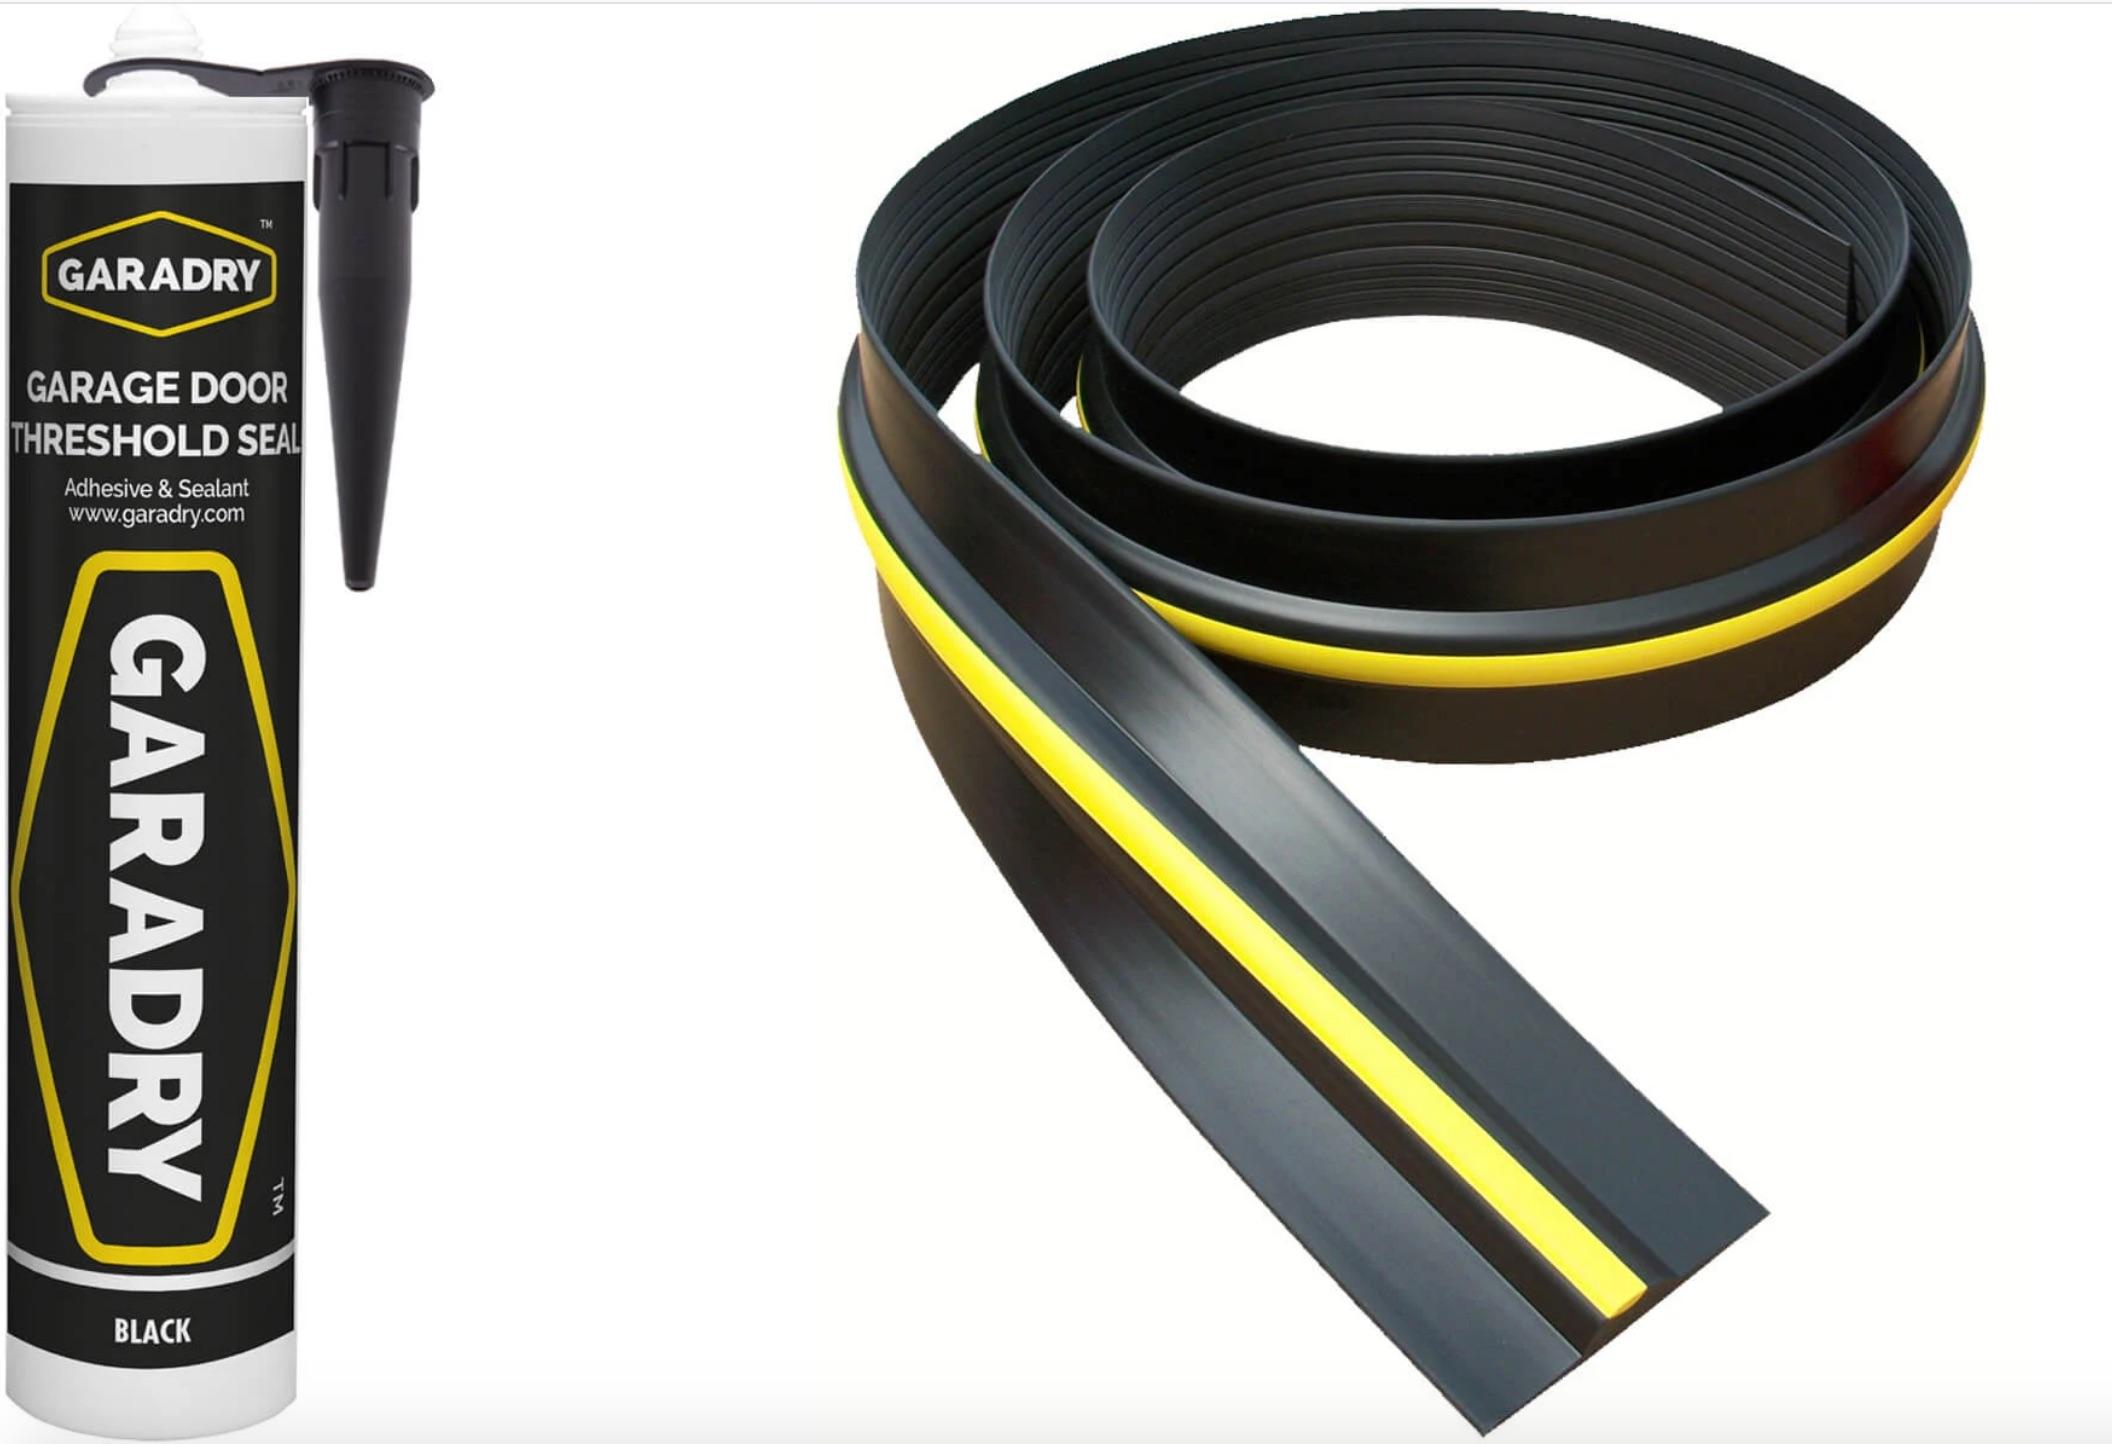 15mm High x 2.21m - 7 foot 3 Long 1 x Adhesive